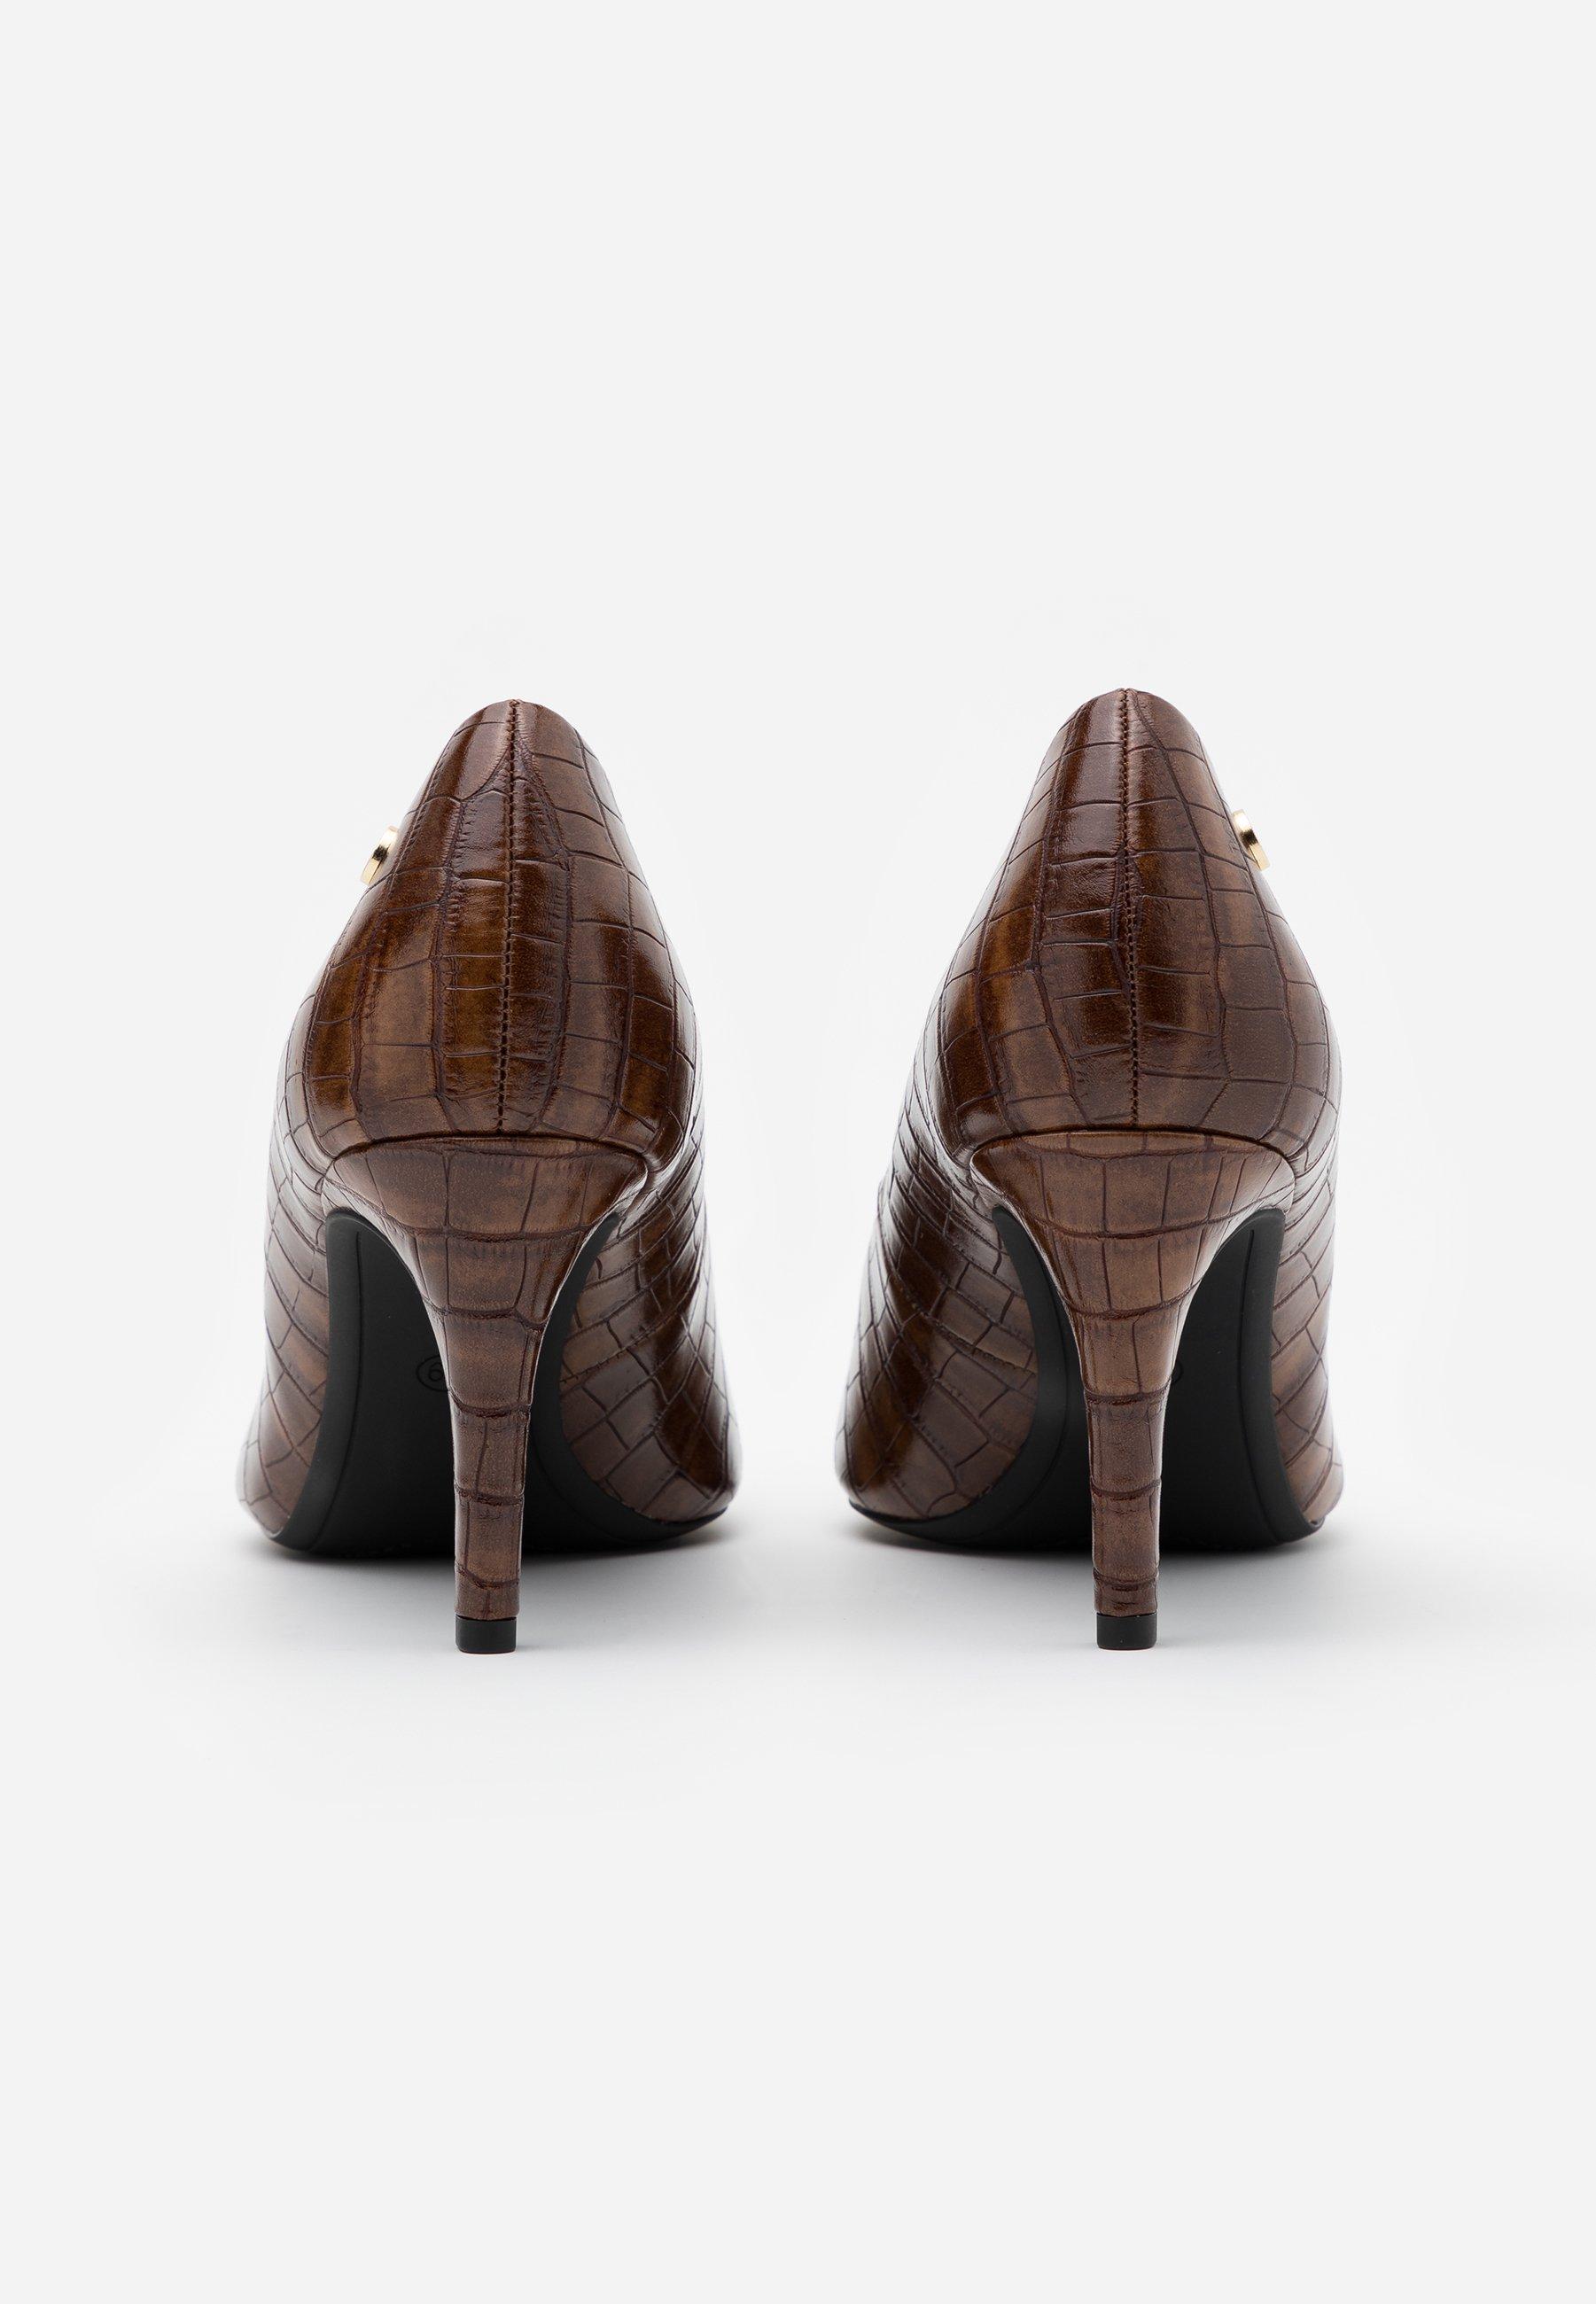 Recomendar barato s.Oliver BLACK LABEL COURT SHOE - Tacones - cognac | Calzado de mujer2020 USaU9